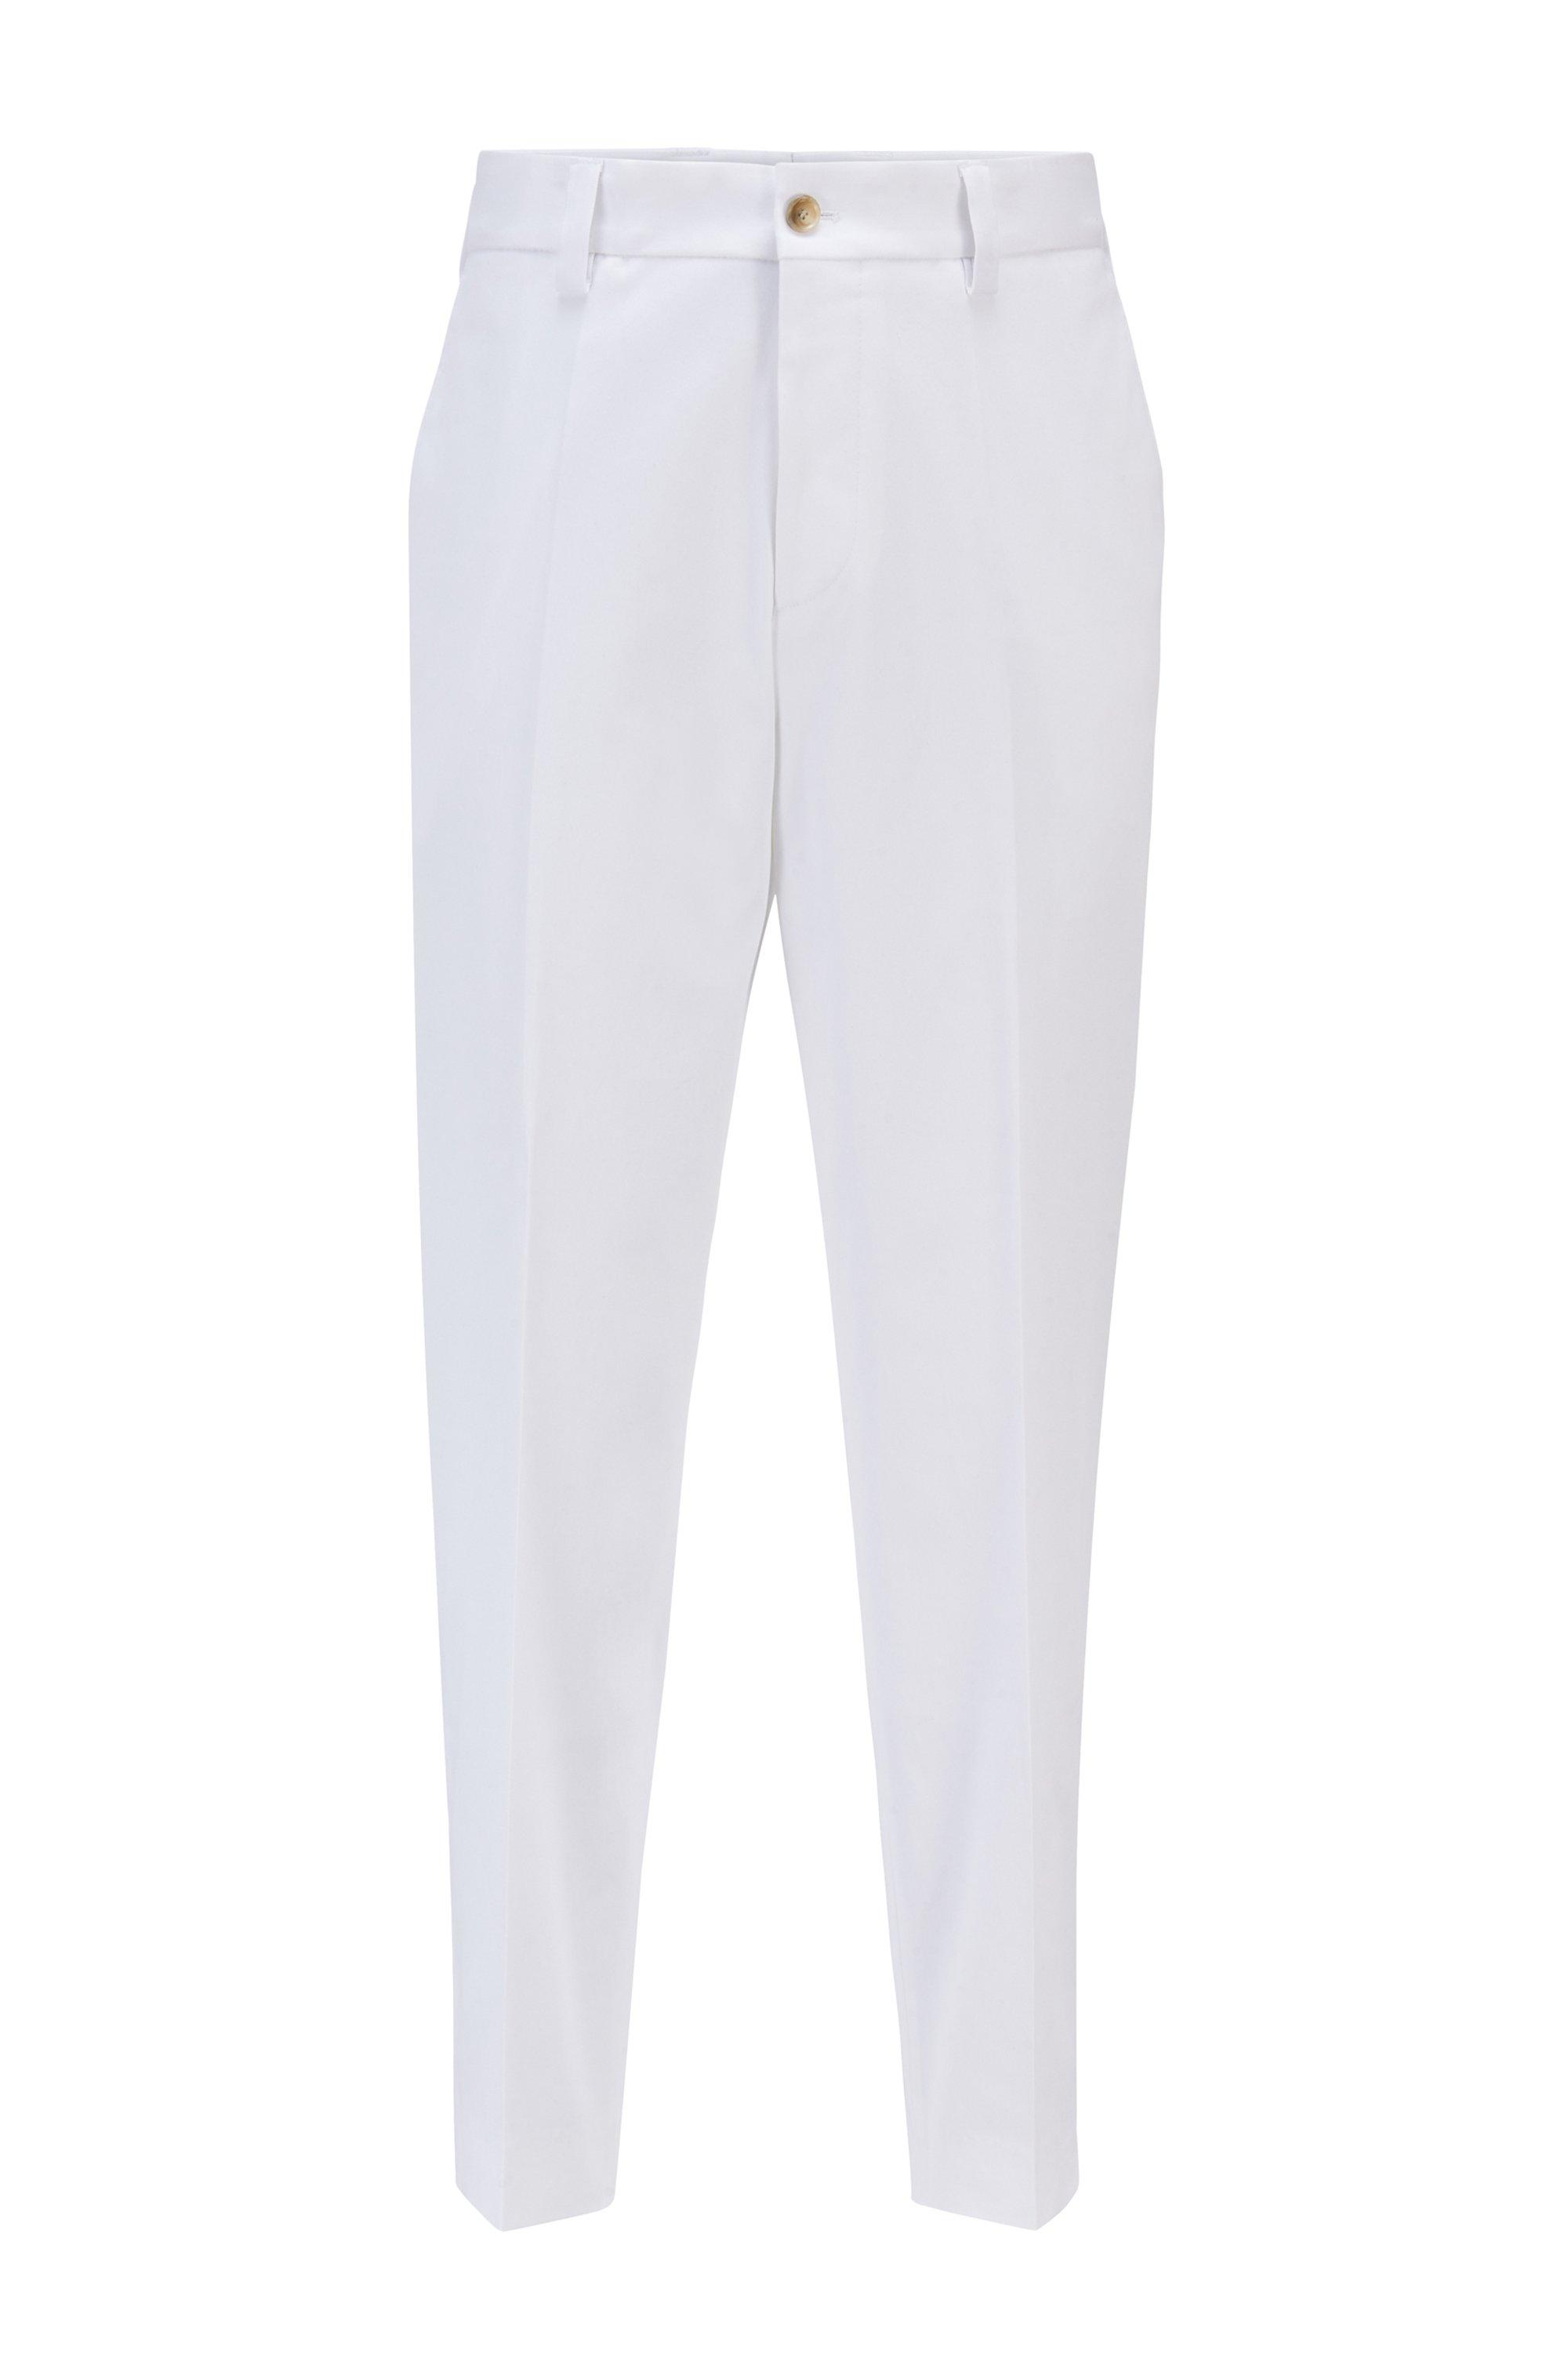 Relaxed-Fit Hose in Cropped-Länge aus elastischem Material-Mix, Weiß